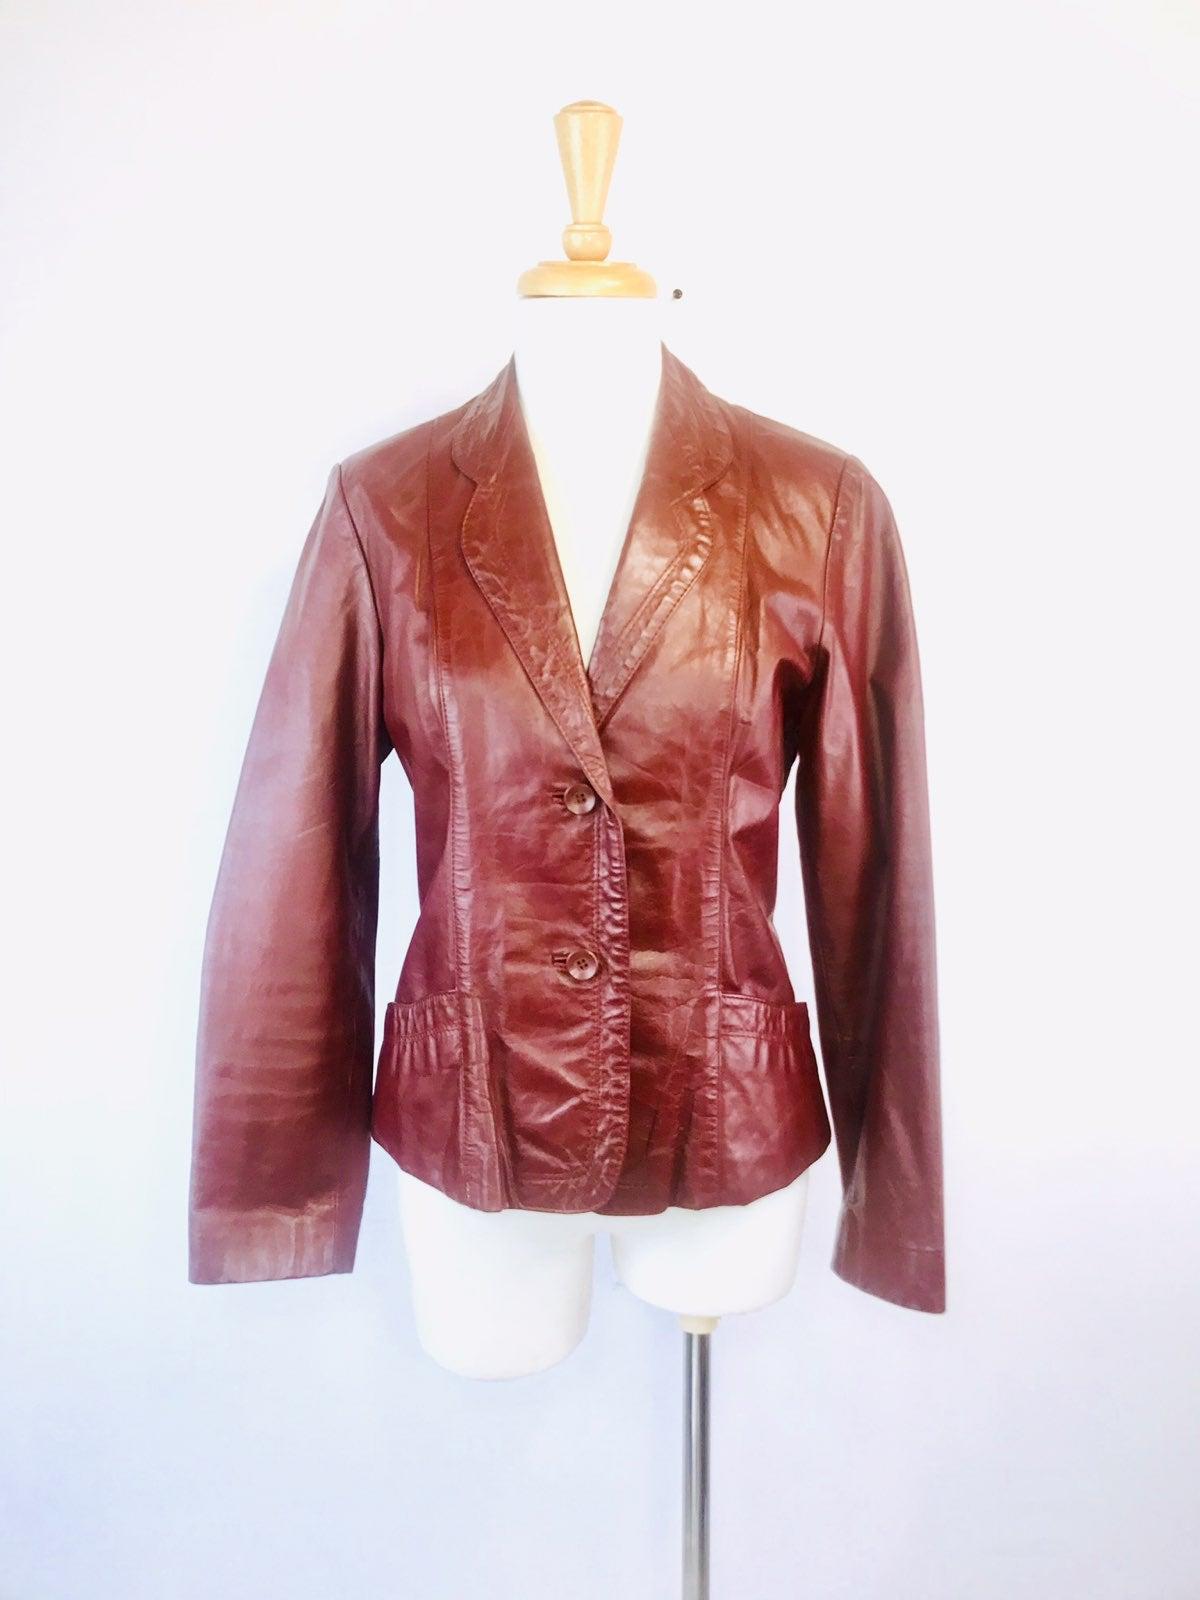 Vintage 1960s -1970s leather jacket 10